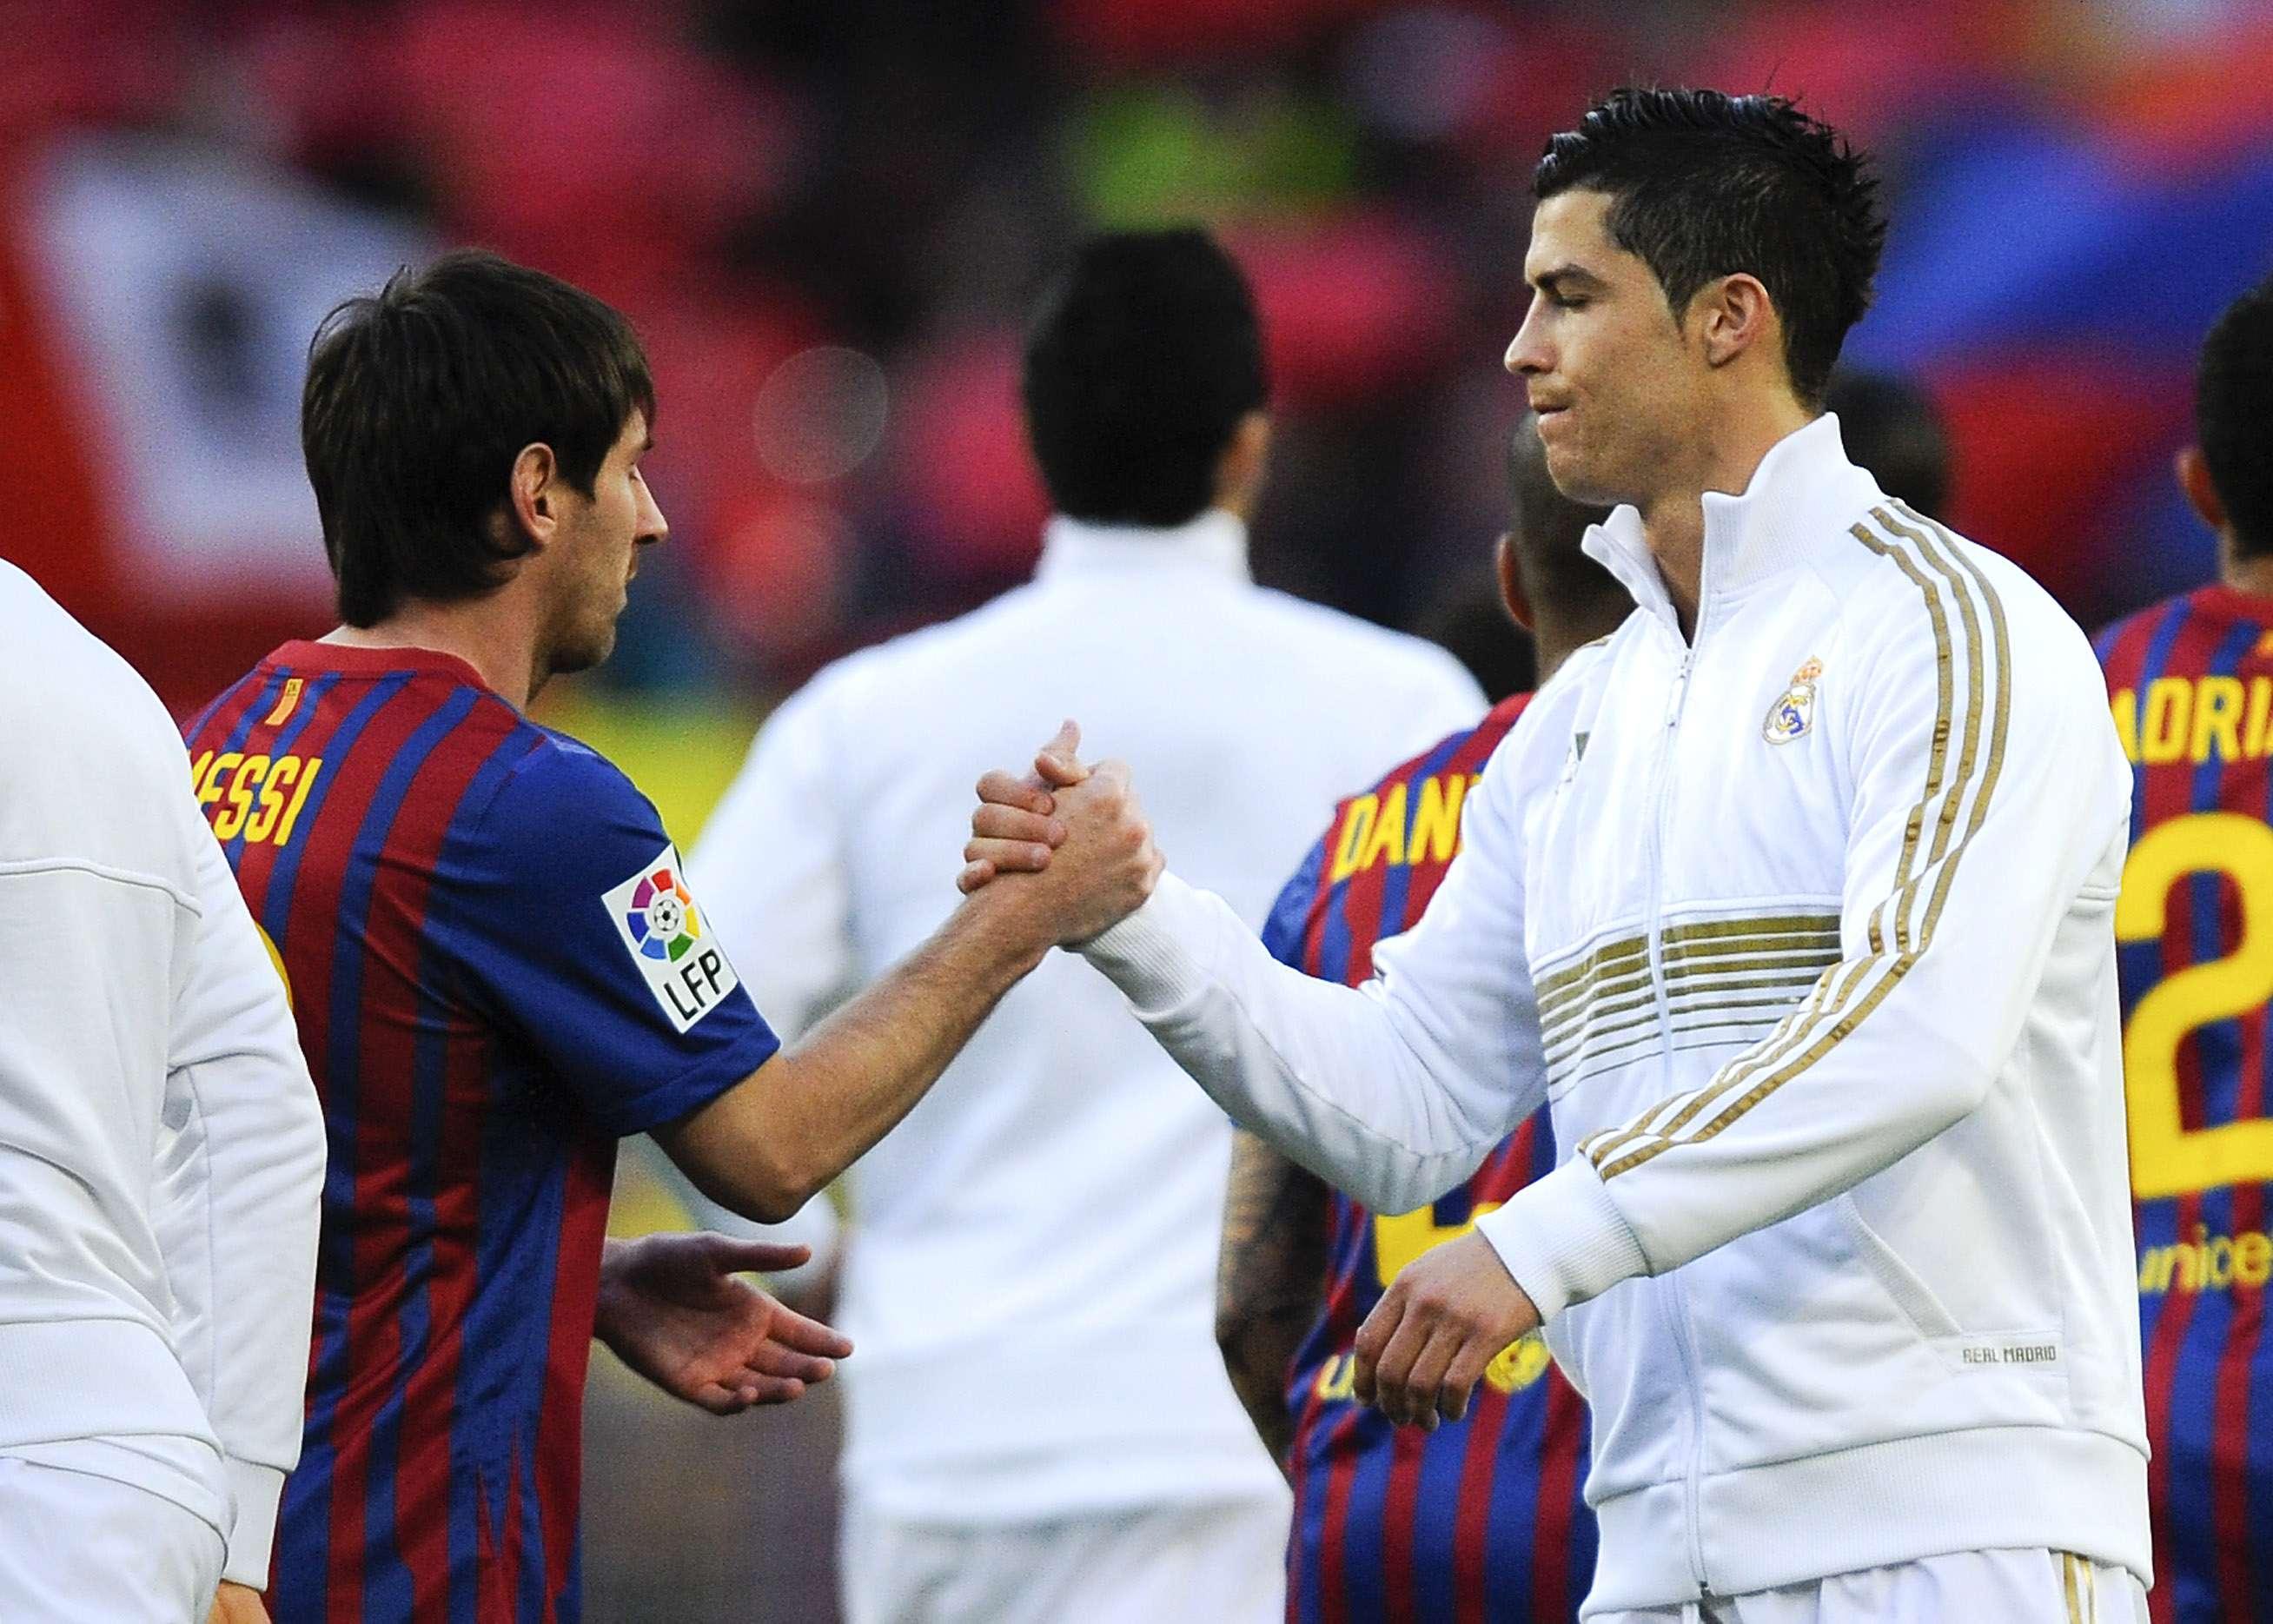 La final de Copa Madrid-Barça romperá el empate histórico